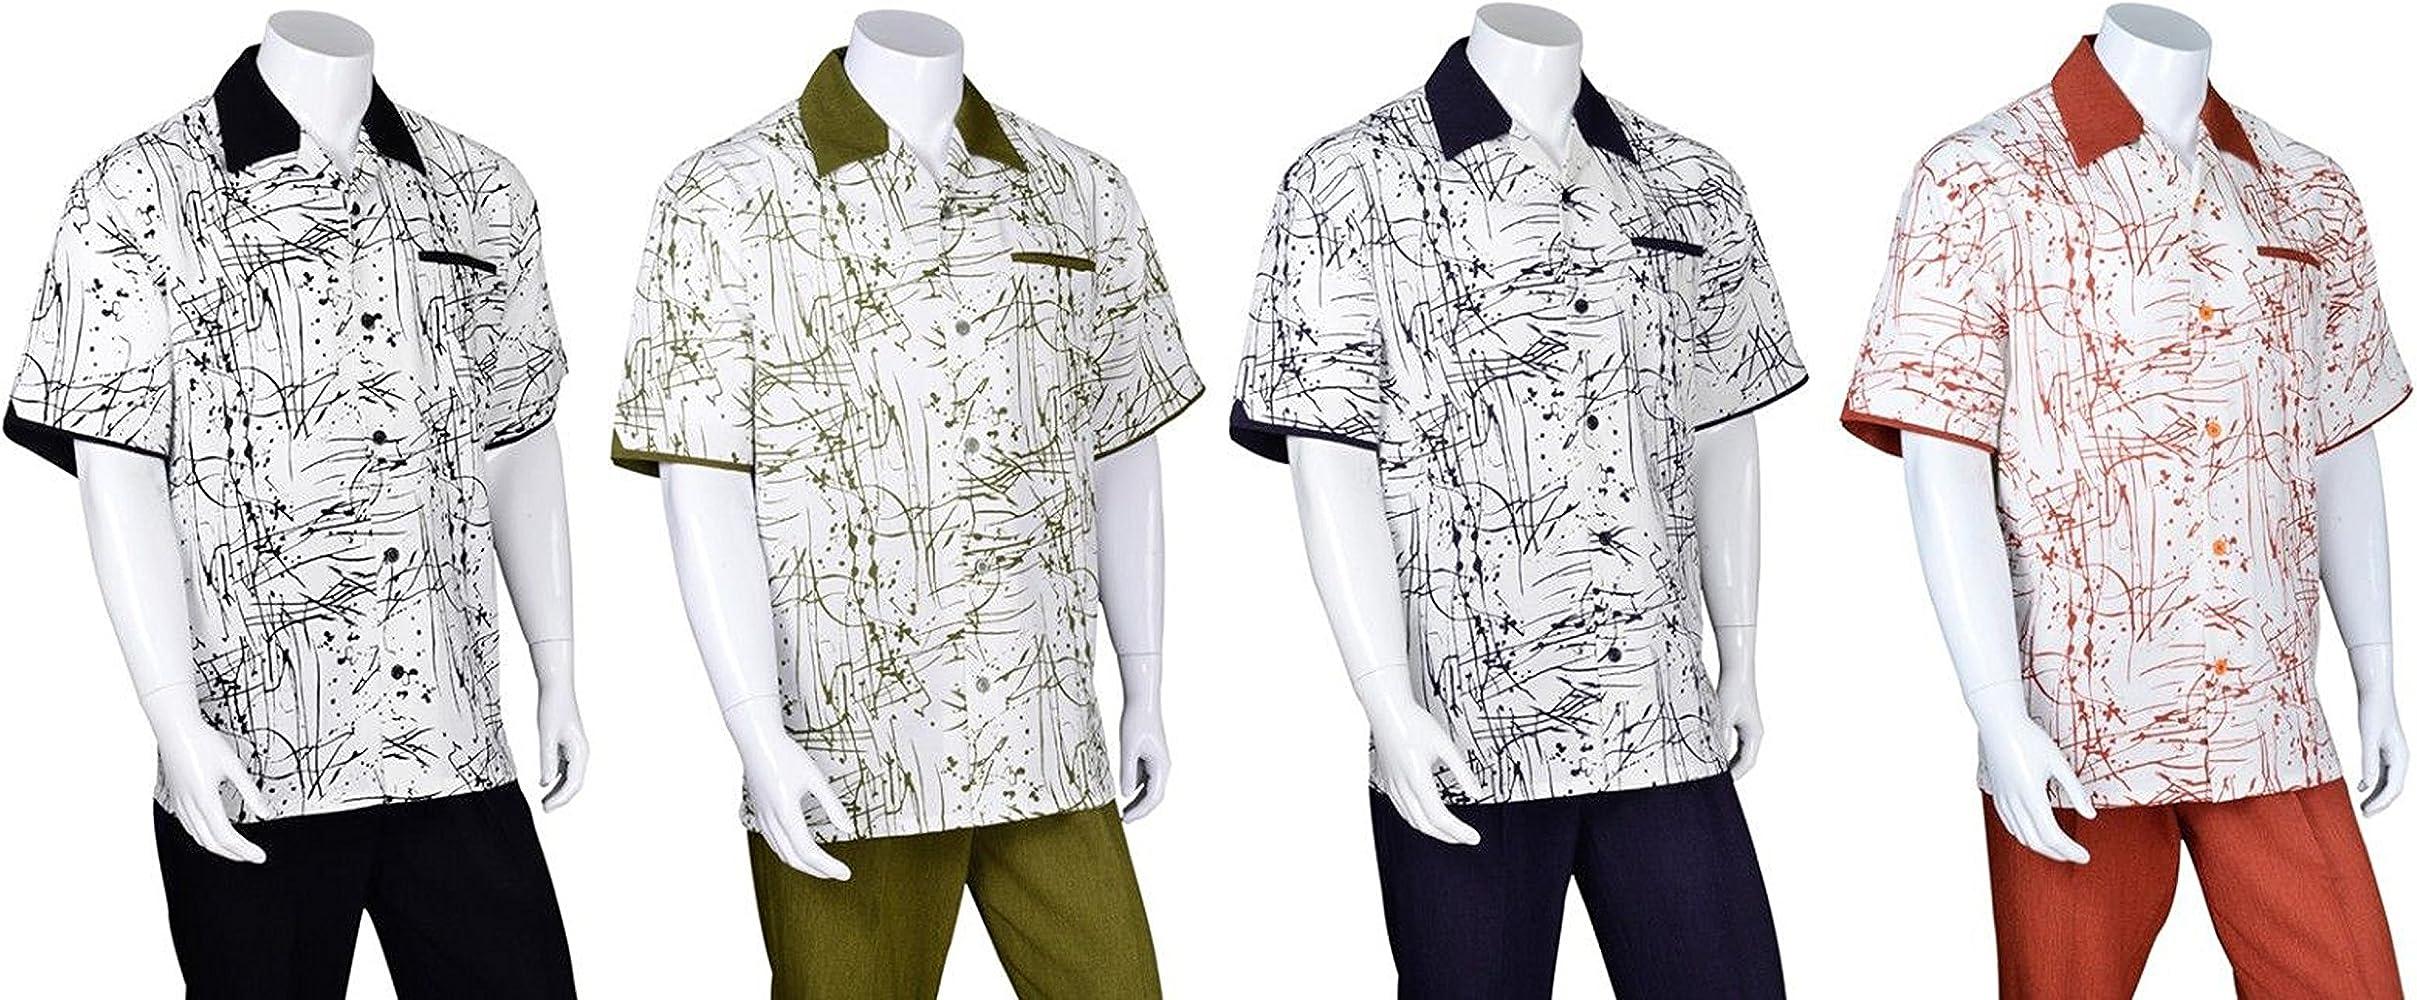 Fortino Landi Plain Walking Suits in 10 Colors M29544